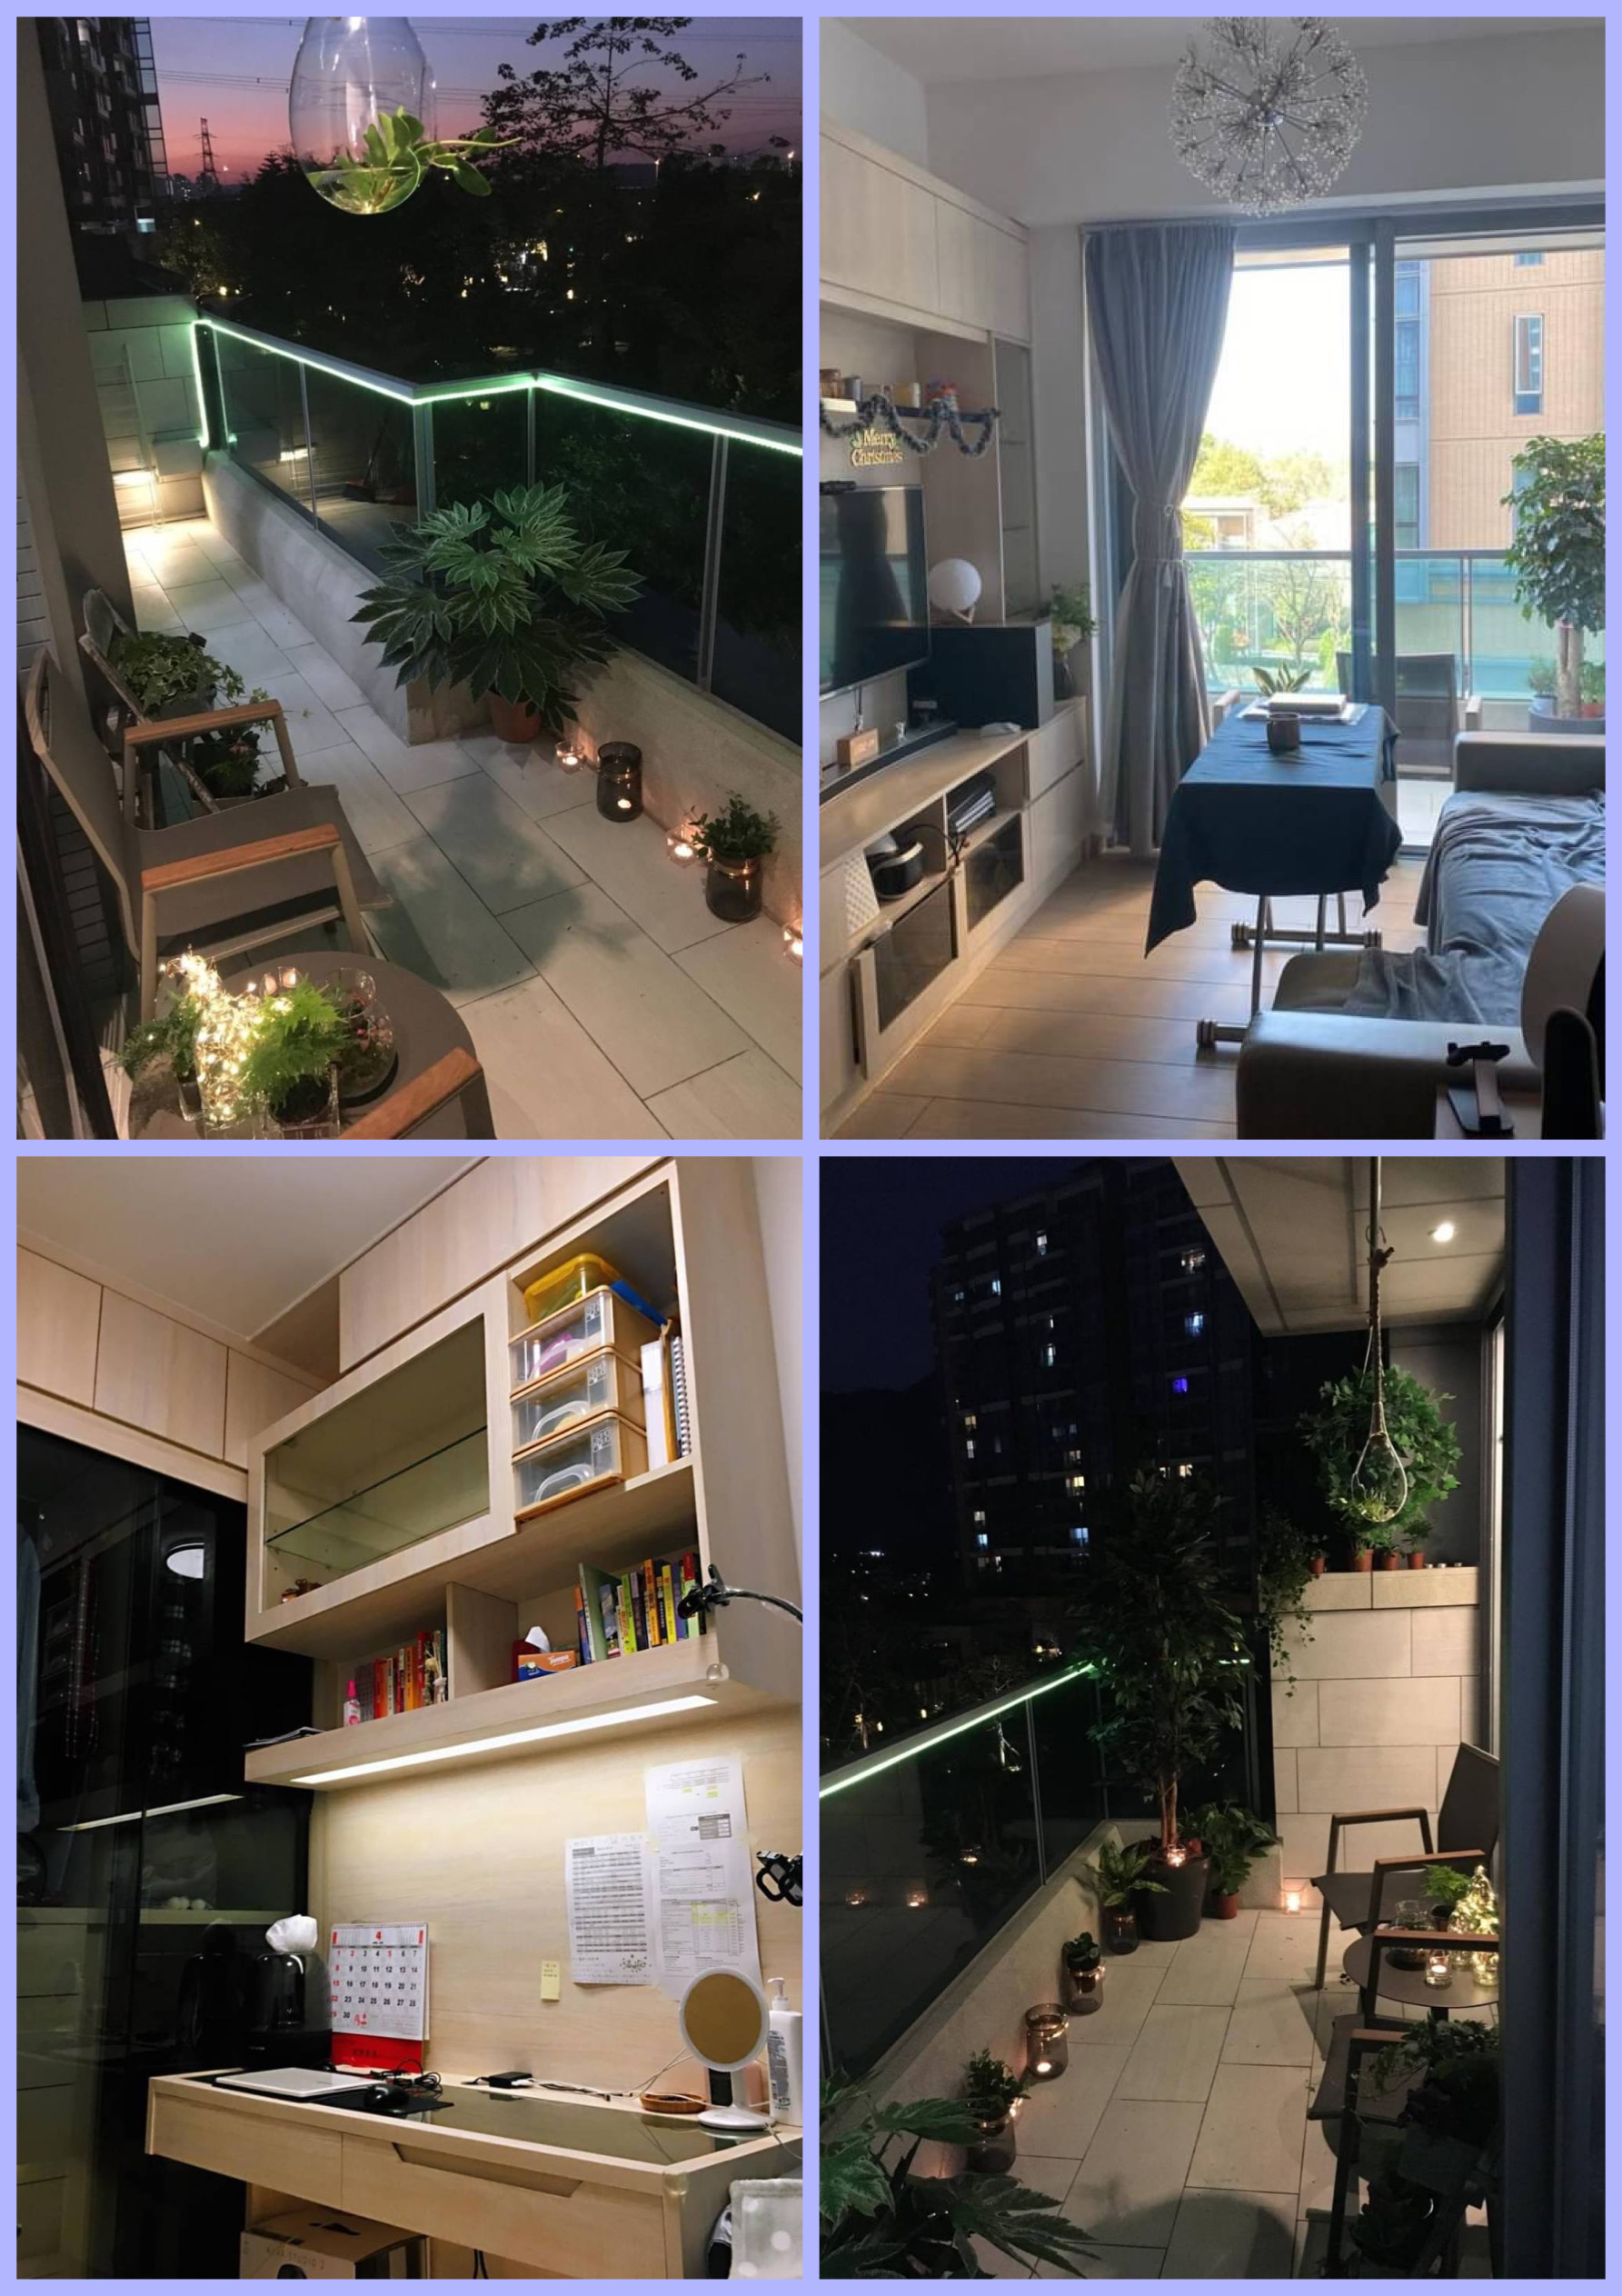 🌺Park Yoho 392呎+100呎平台🥳溫馨實用空間💫聯絡我睇真盤👍🏻真價格🥂